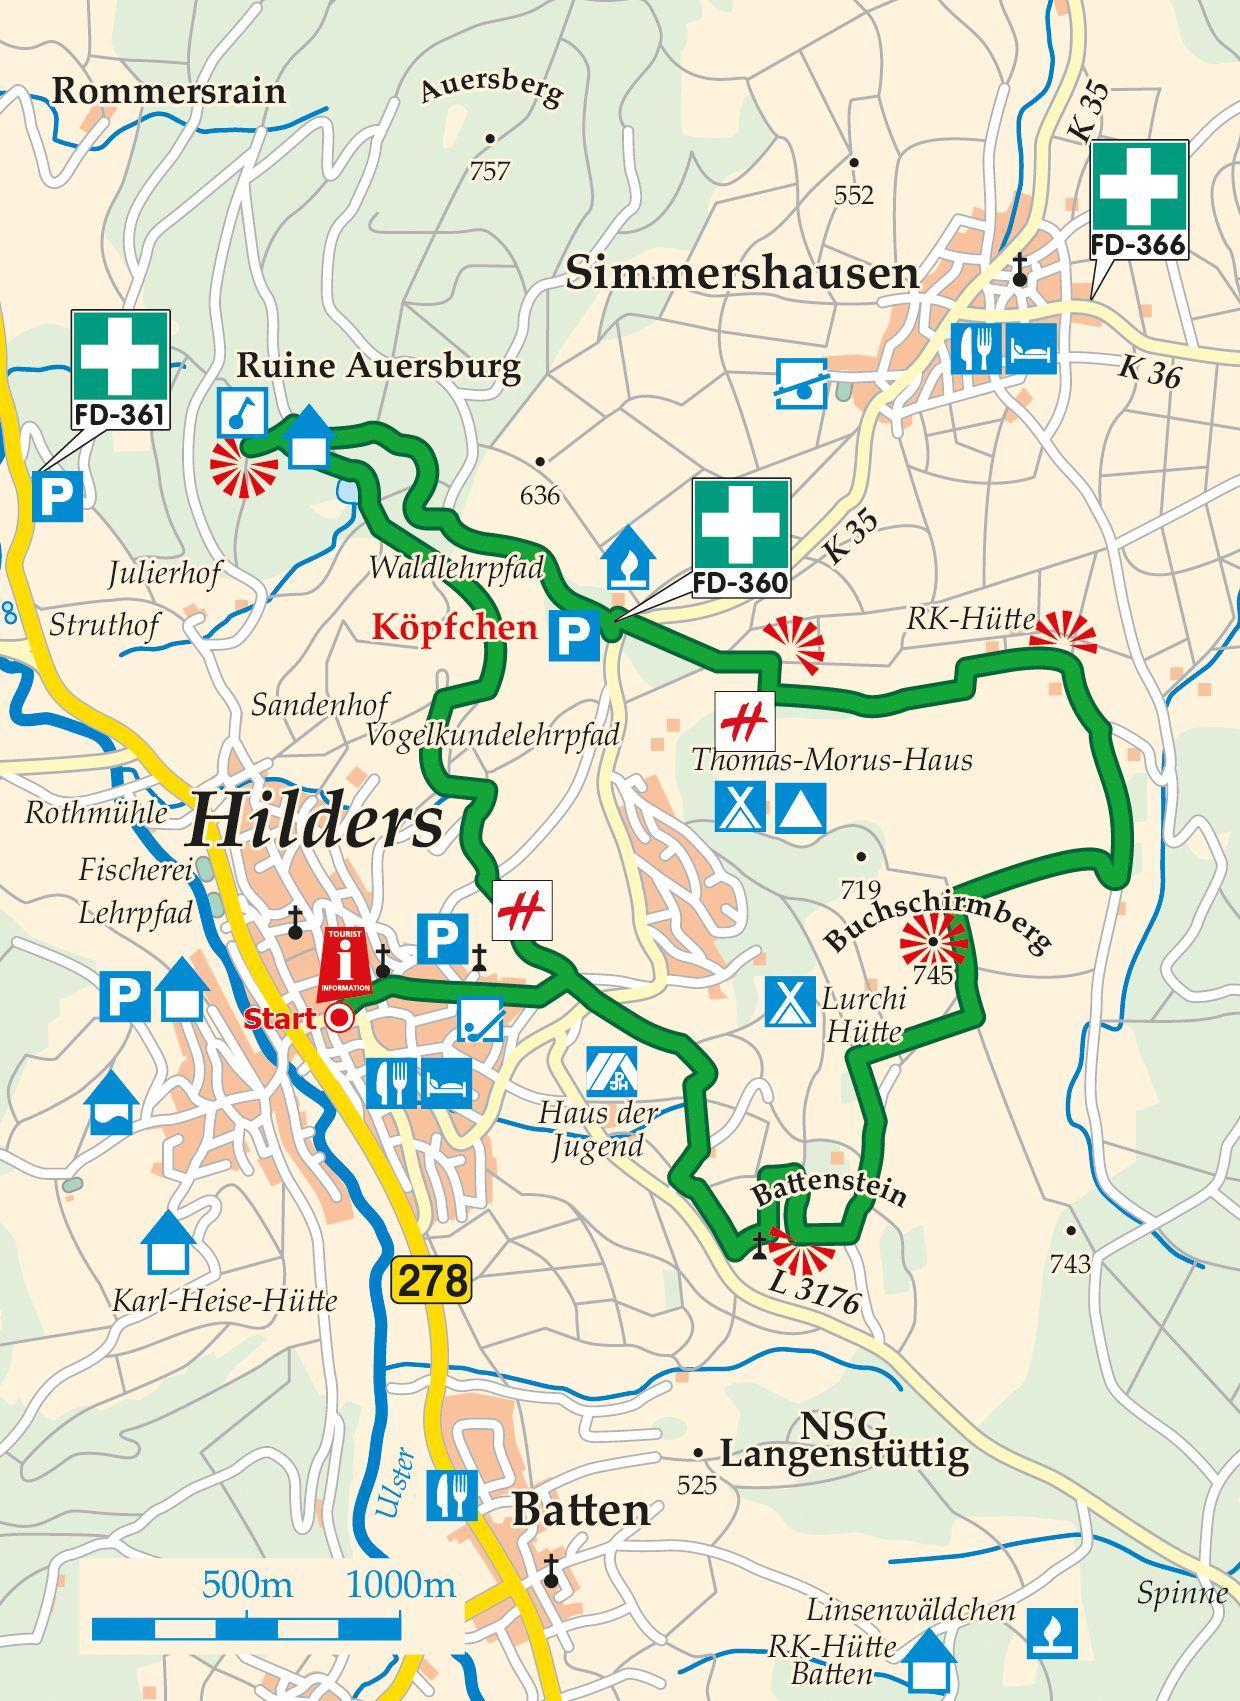 Extratour Der Hilderser Karte